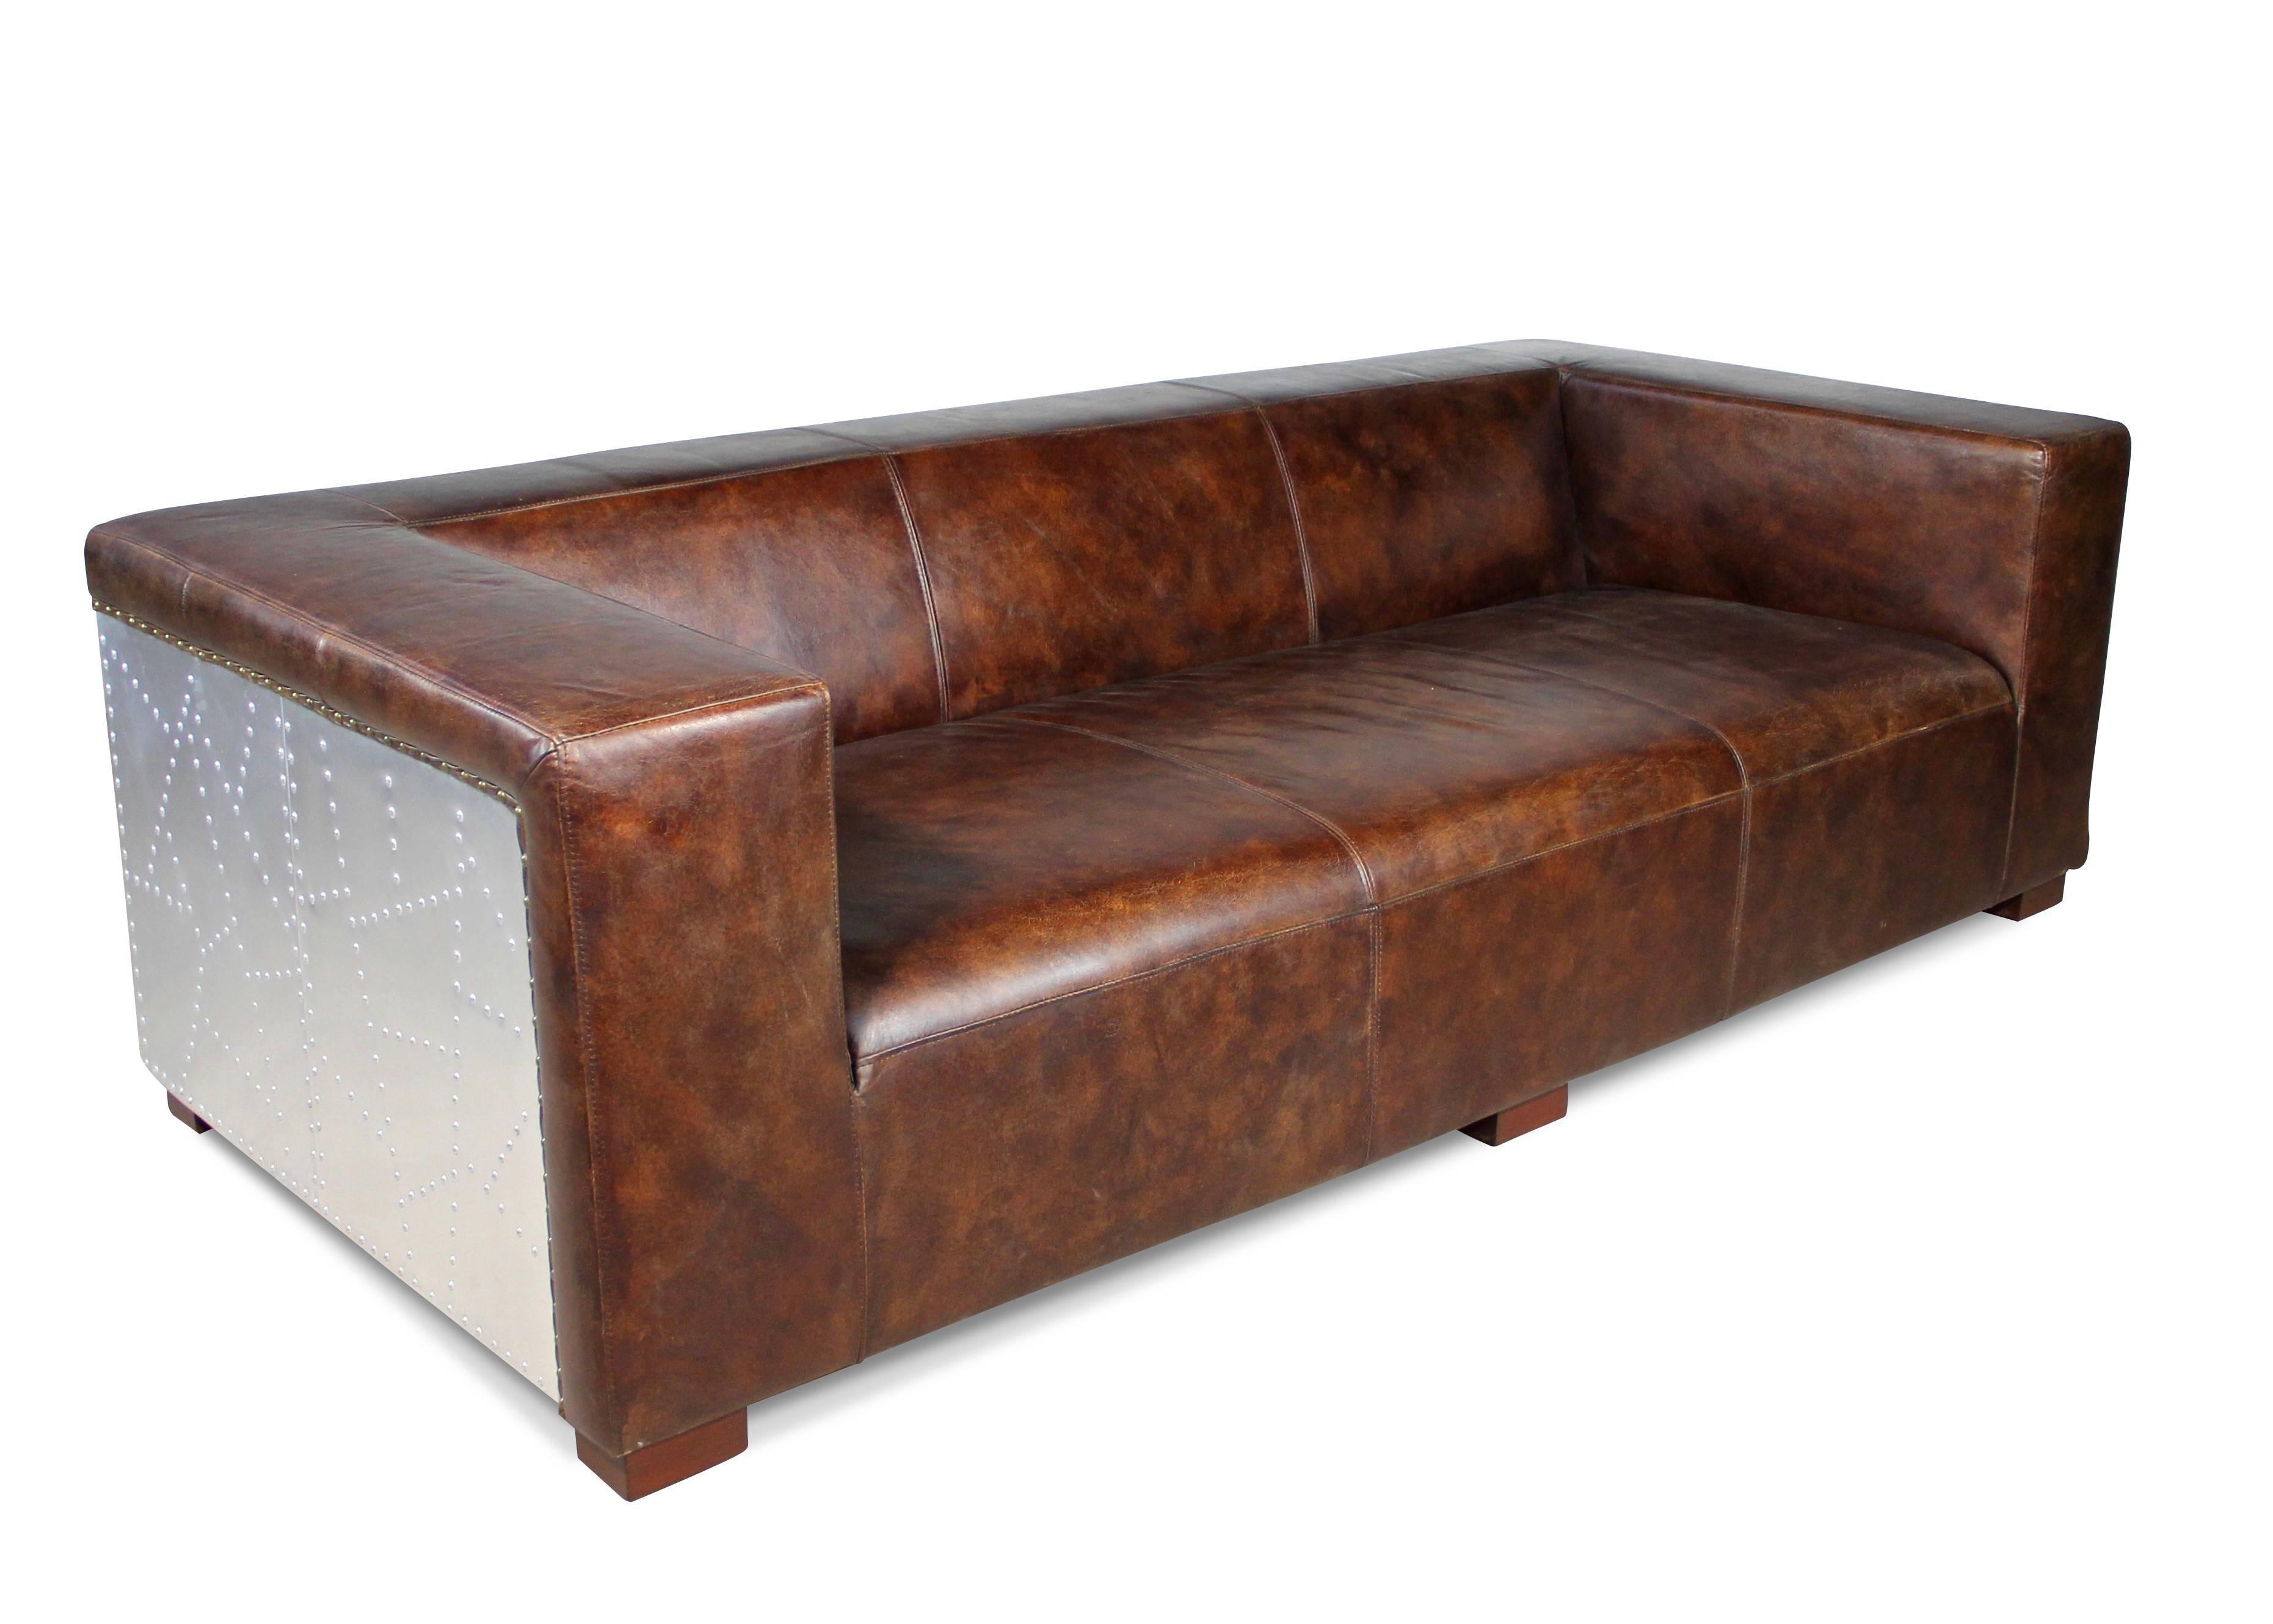 3 Sitzer Sofa Leder Braun